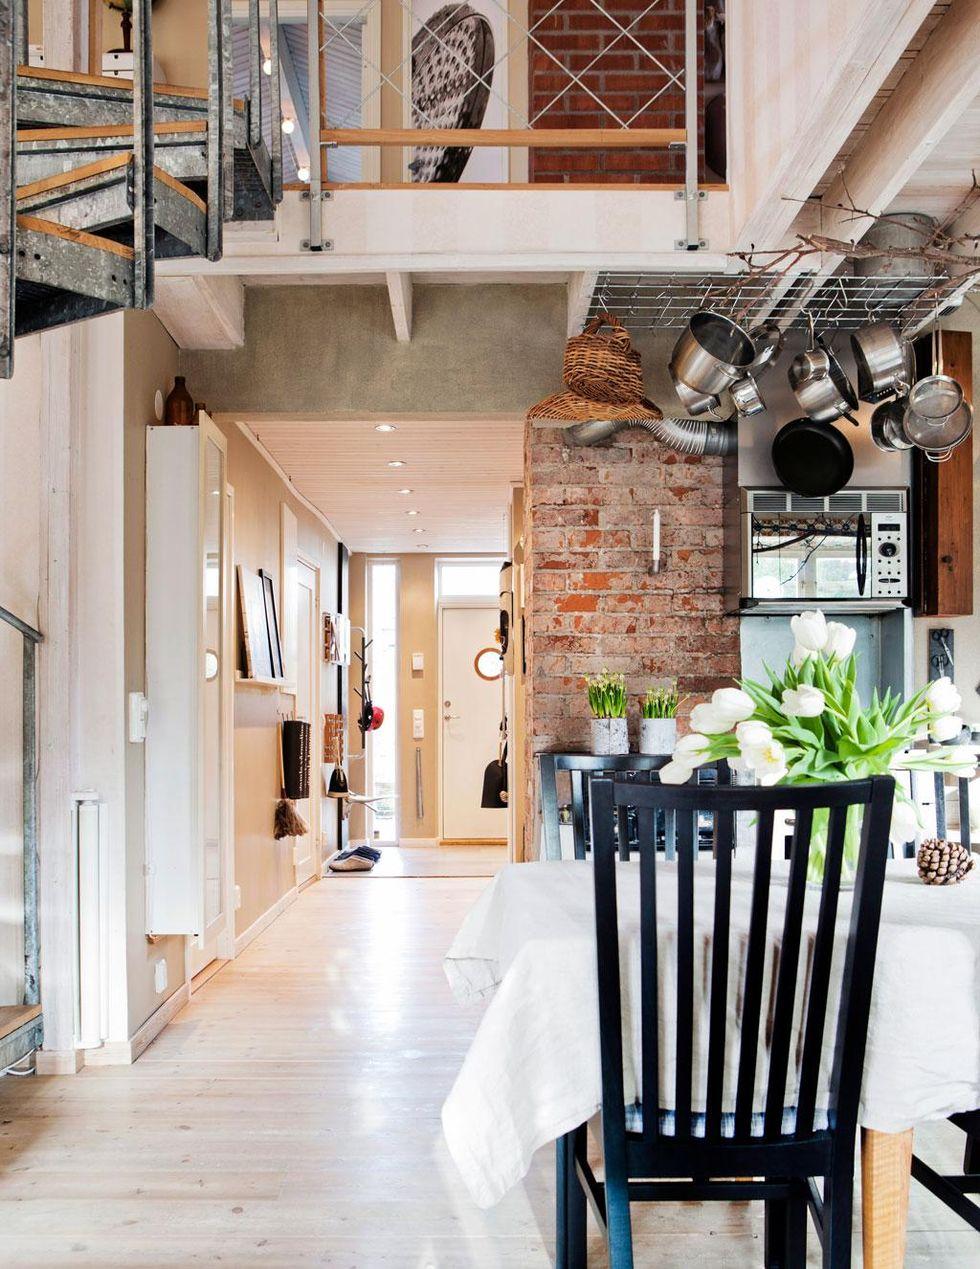 Inspiring Industrial Interiors That Features Exposed Brick Walls